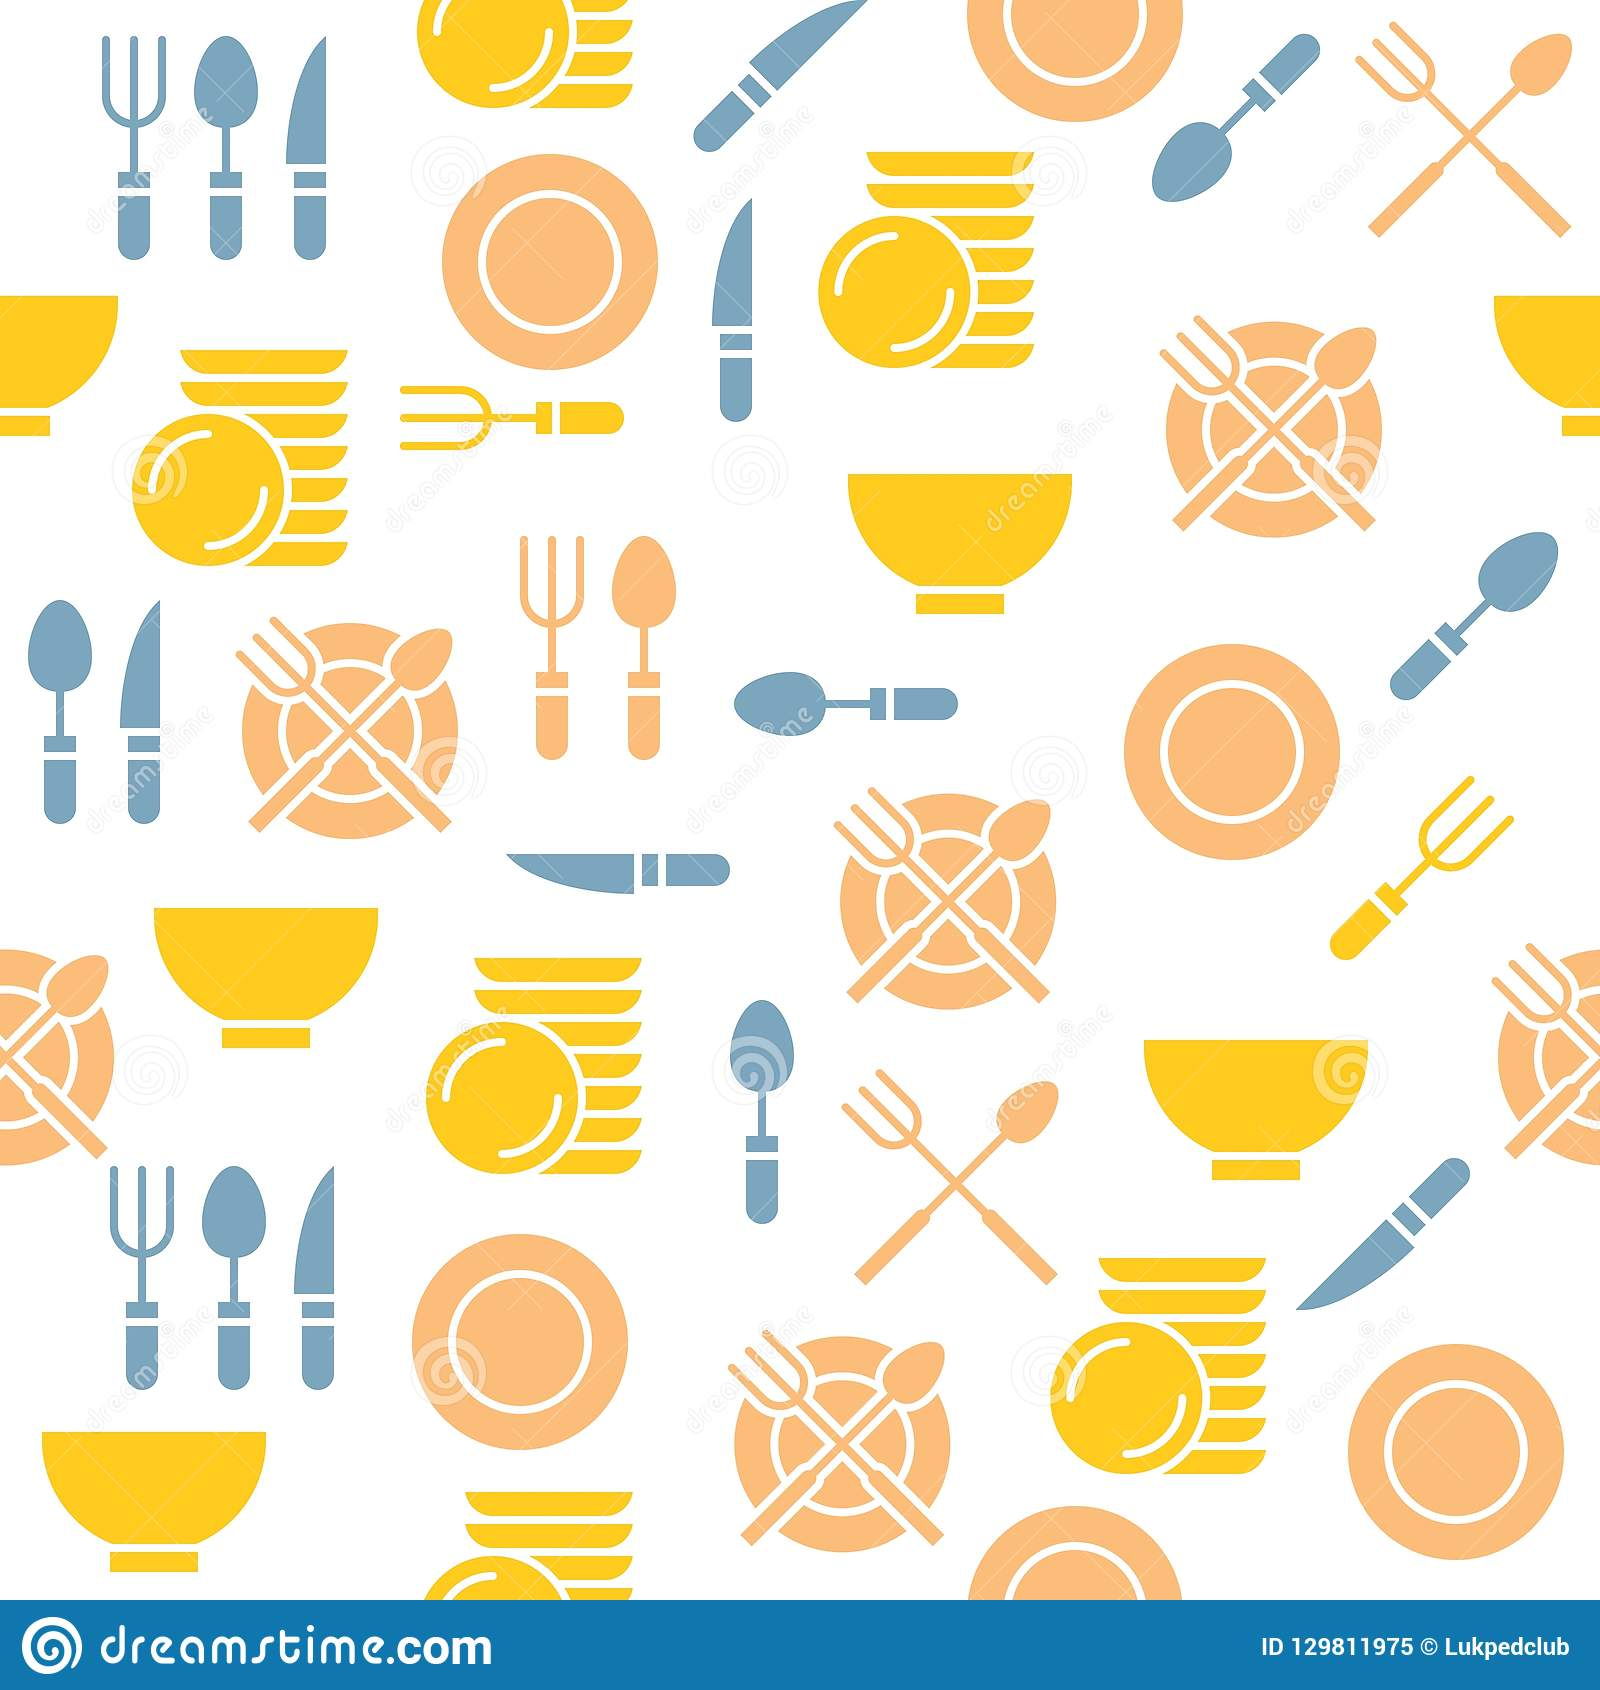 Kitchen Utensils Seamless Pattern For Wallpaper Or Print On Wrap